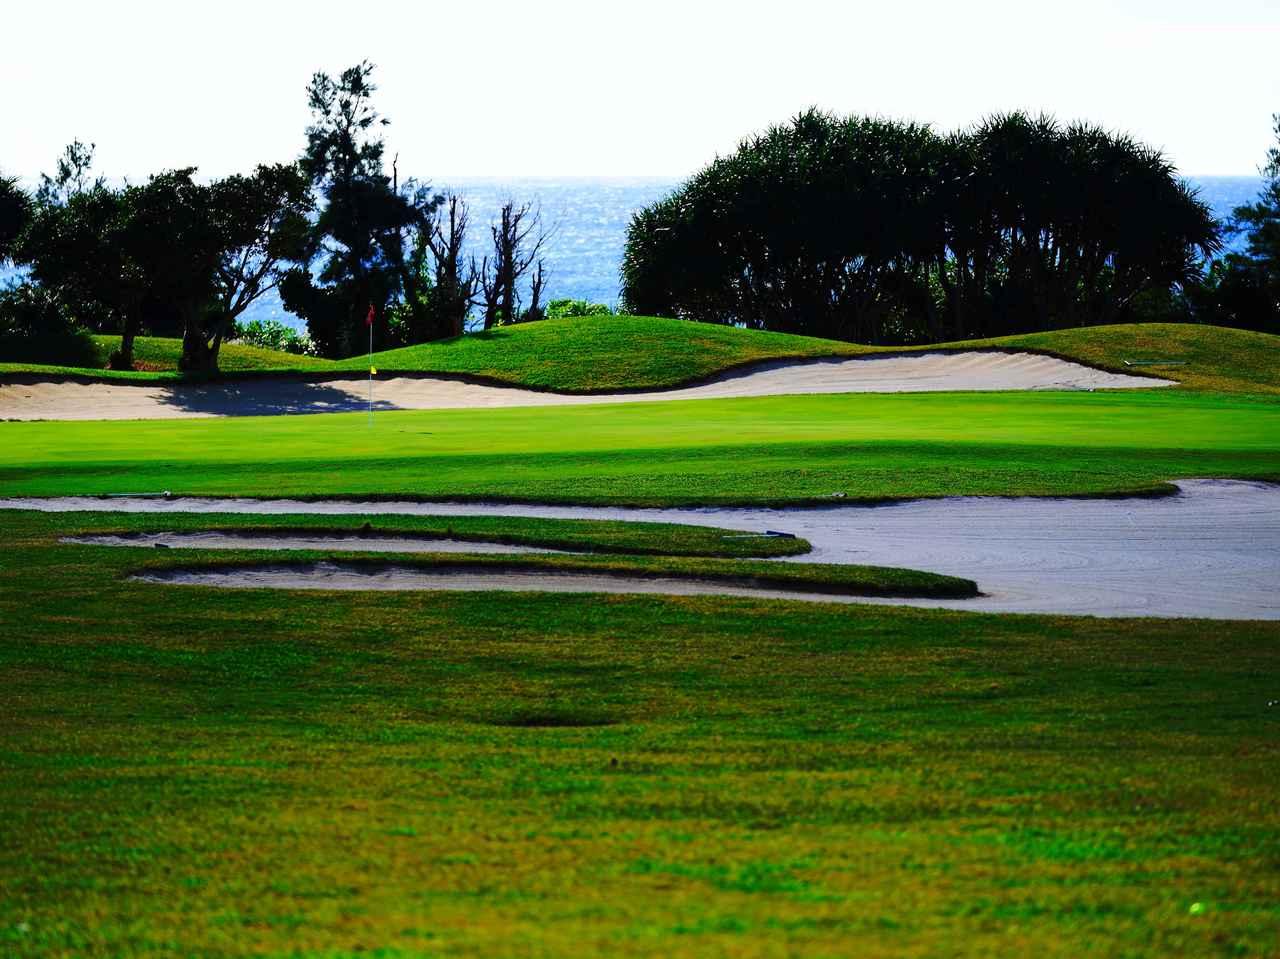 Images : 5番目の画像 - シギラベイカントリークラブ - ゴルフへ行こうWEB by ゴルフダイジェスト